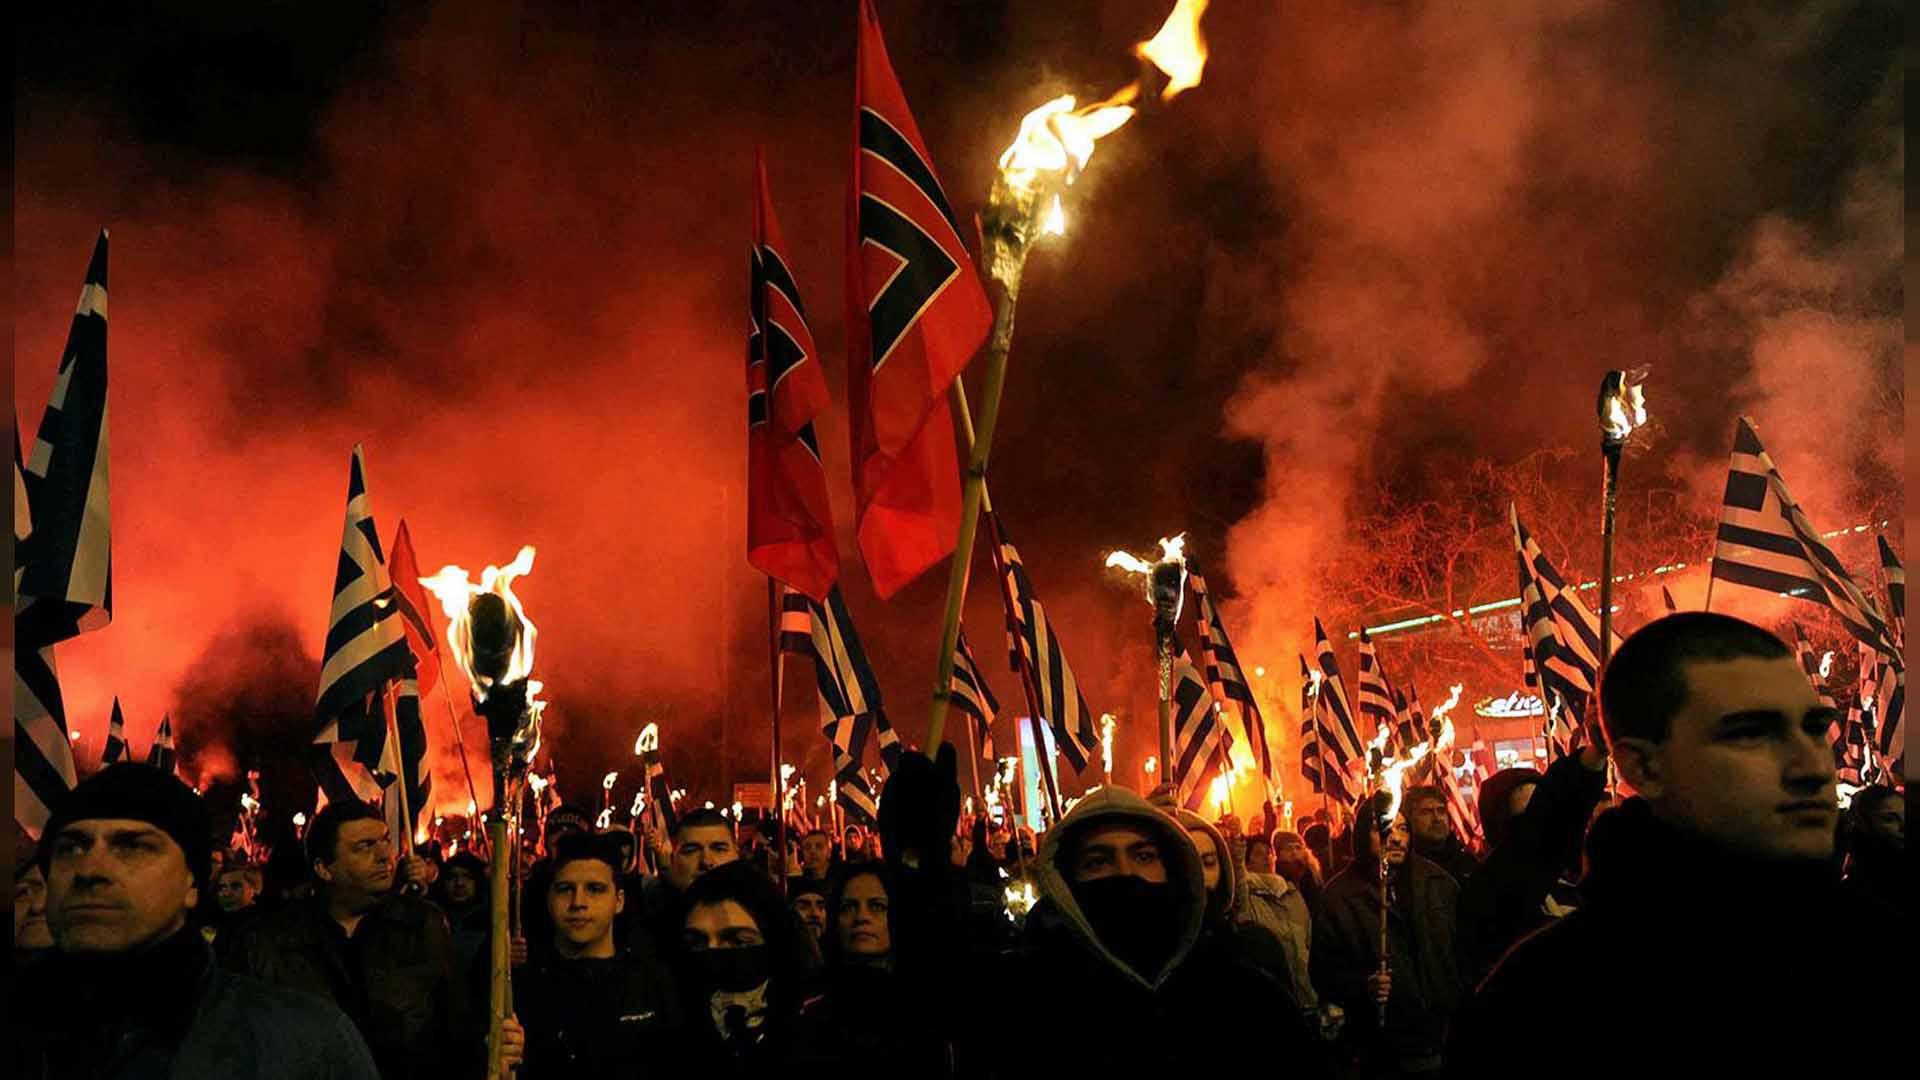 fascisti grecia chios profughi